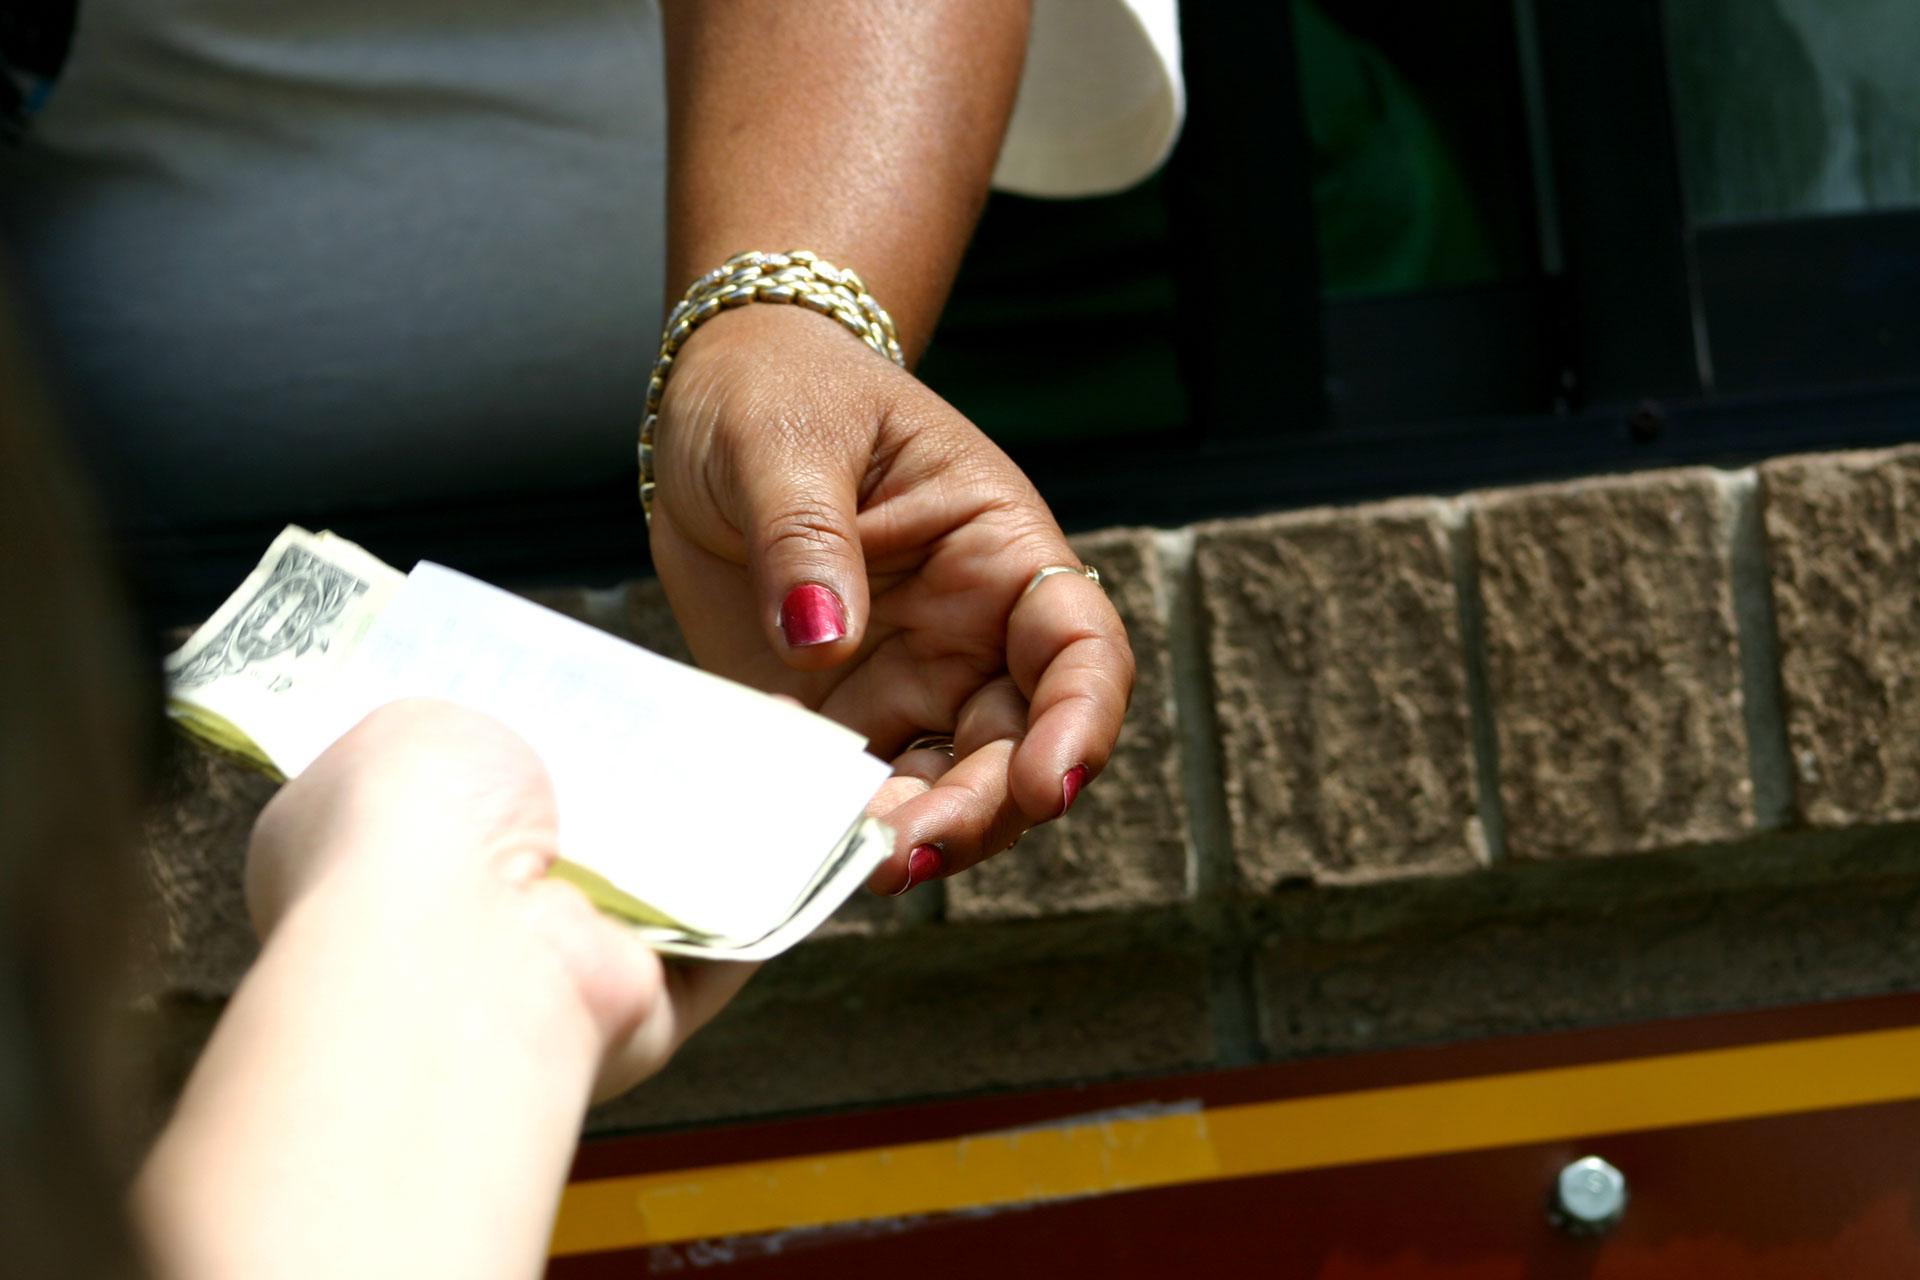 hands exchanging money at a drive-thru window